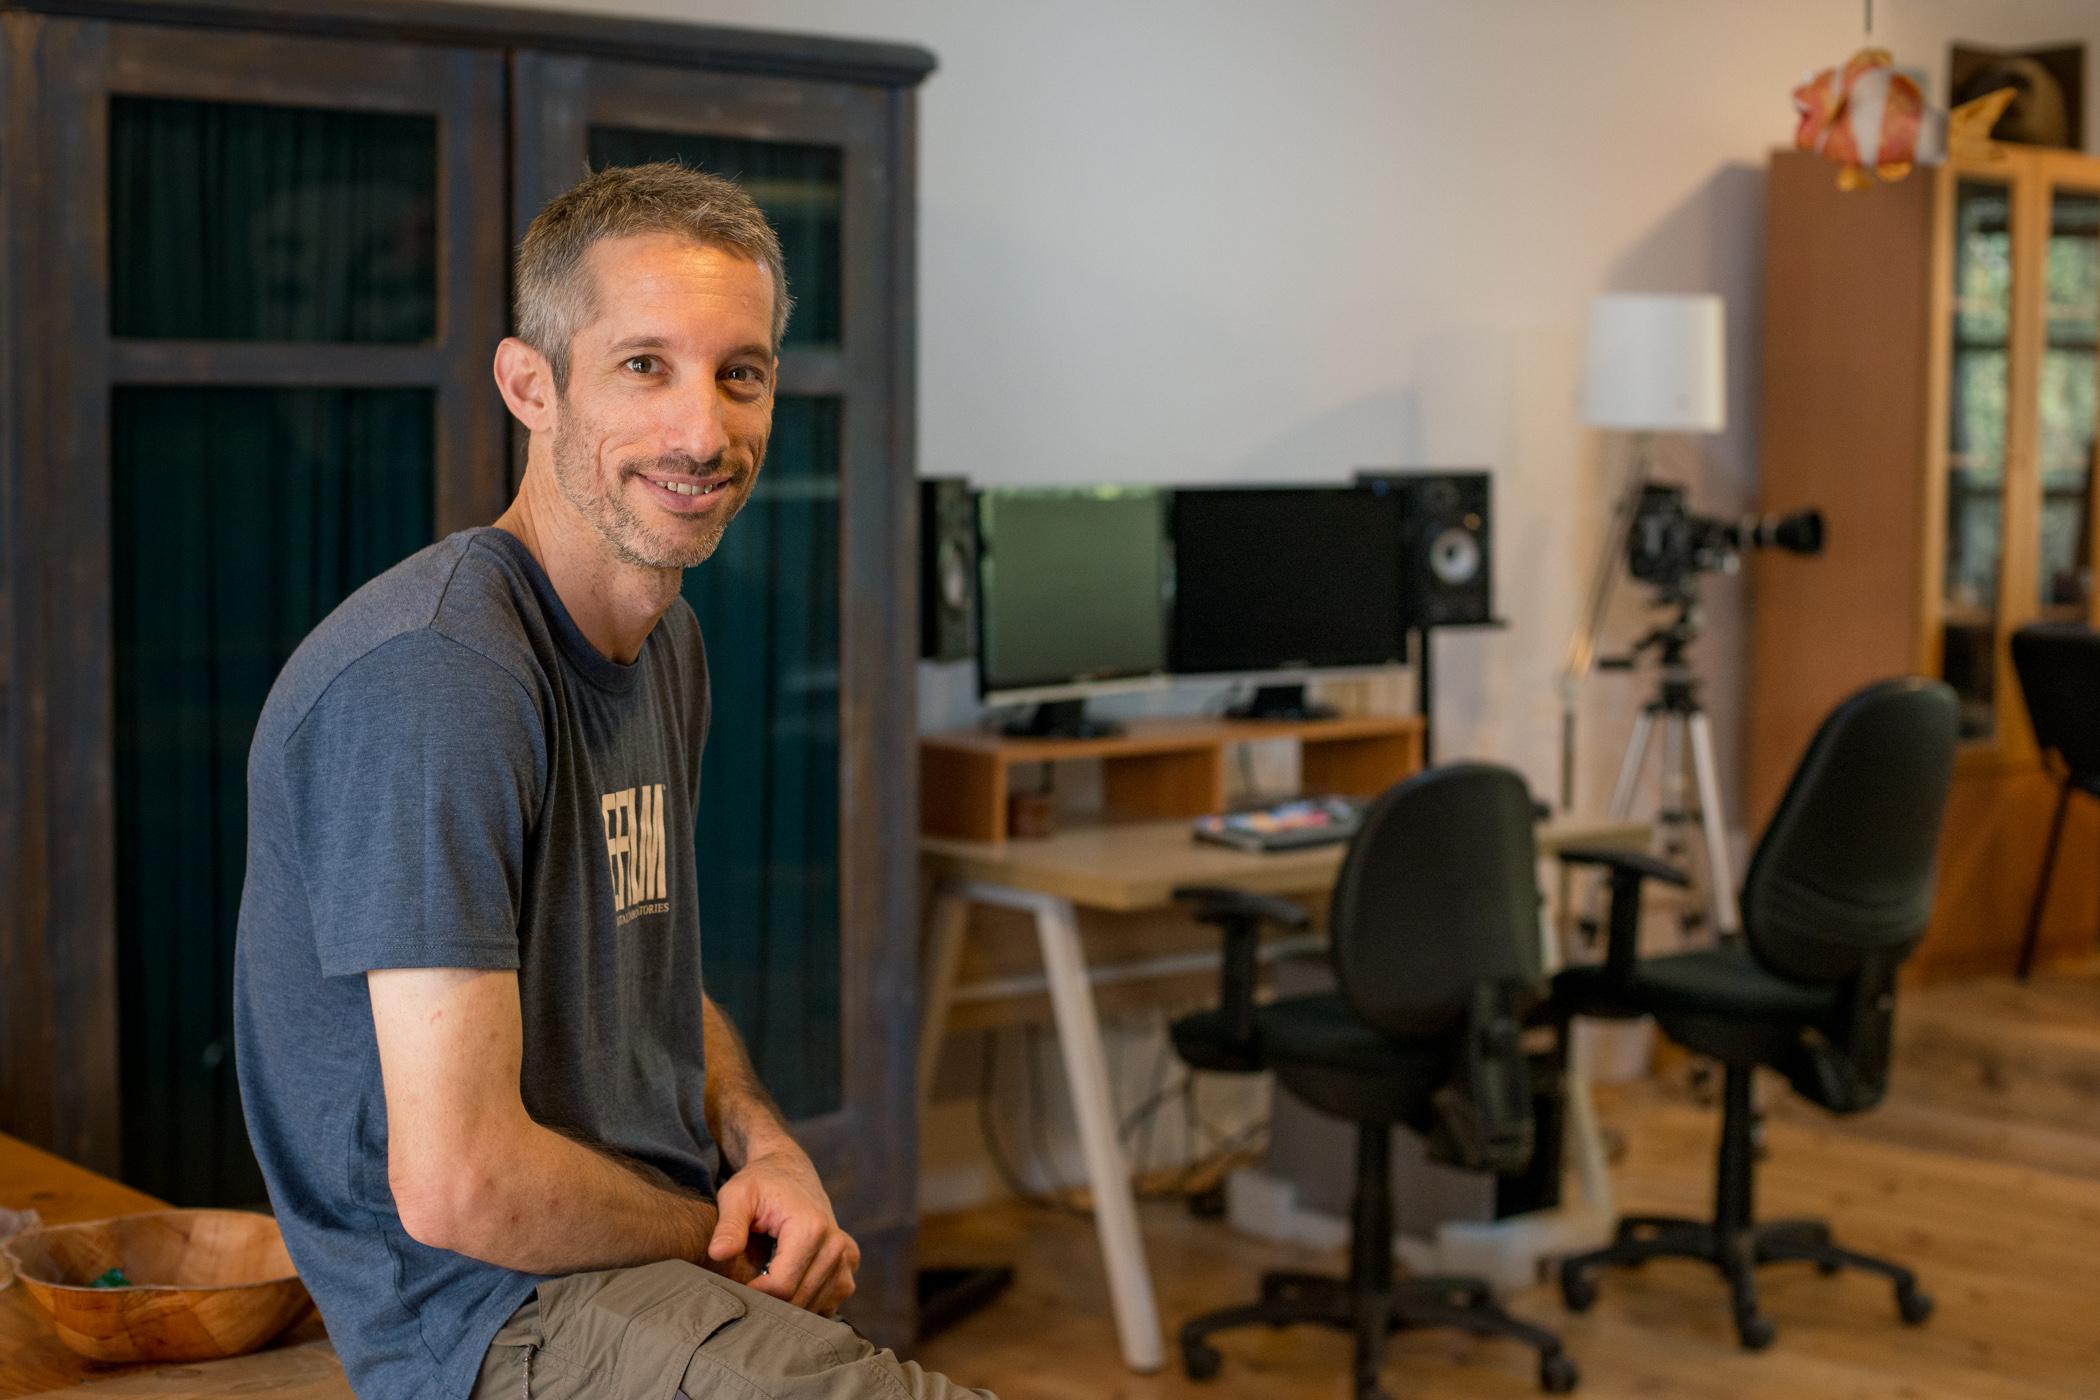 Arbel in his production studio. Ein-HaShofet, Israel